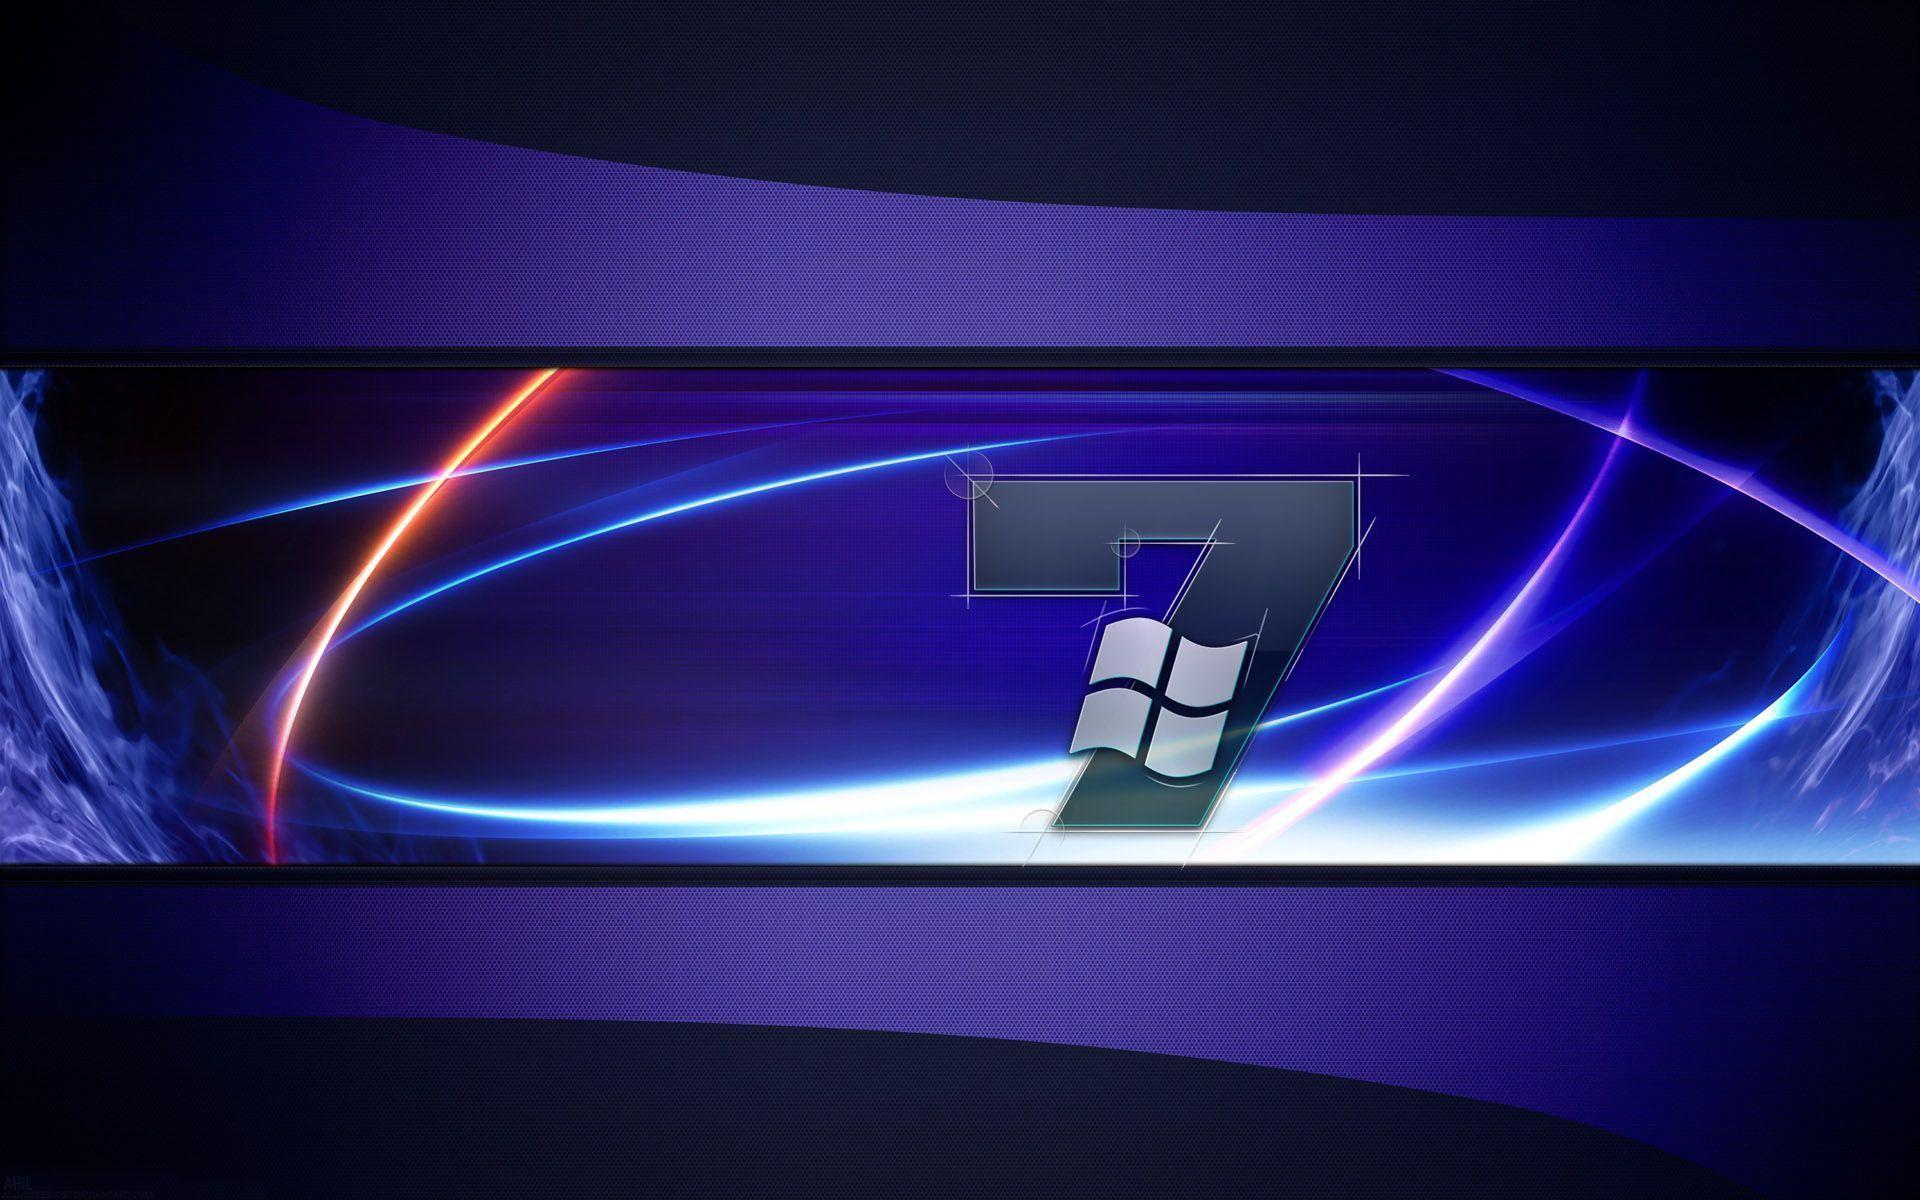 Windows 7 Hd Wallpapers 1080p Free Download Imagem Do